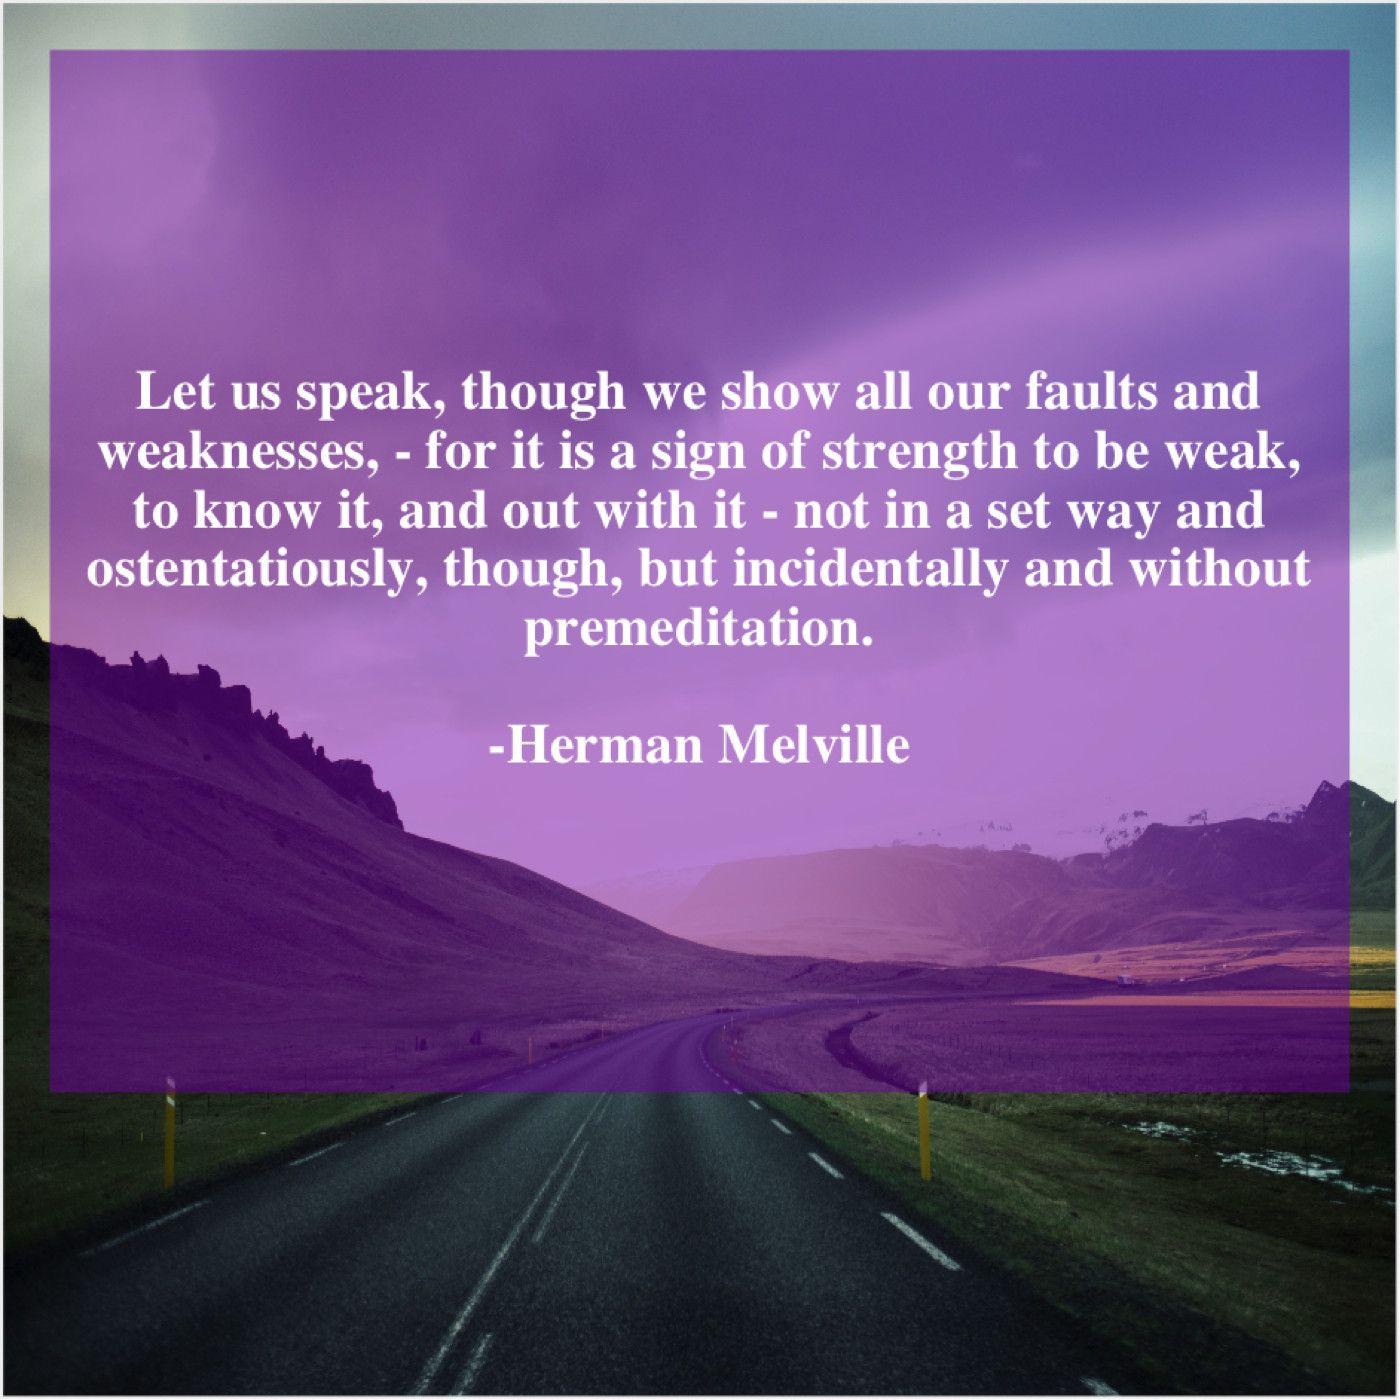 Herman Melville Let Us Speak Though We George Macdonald Old Things Thomas Carlyle